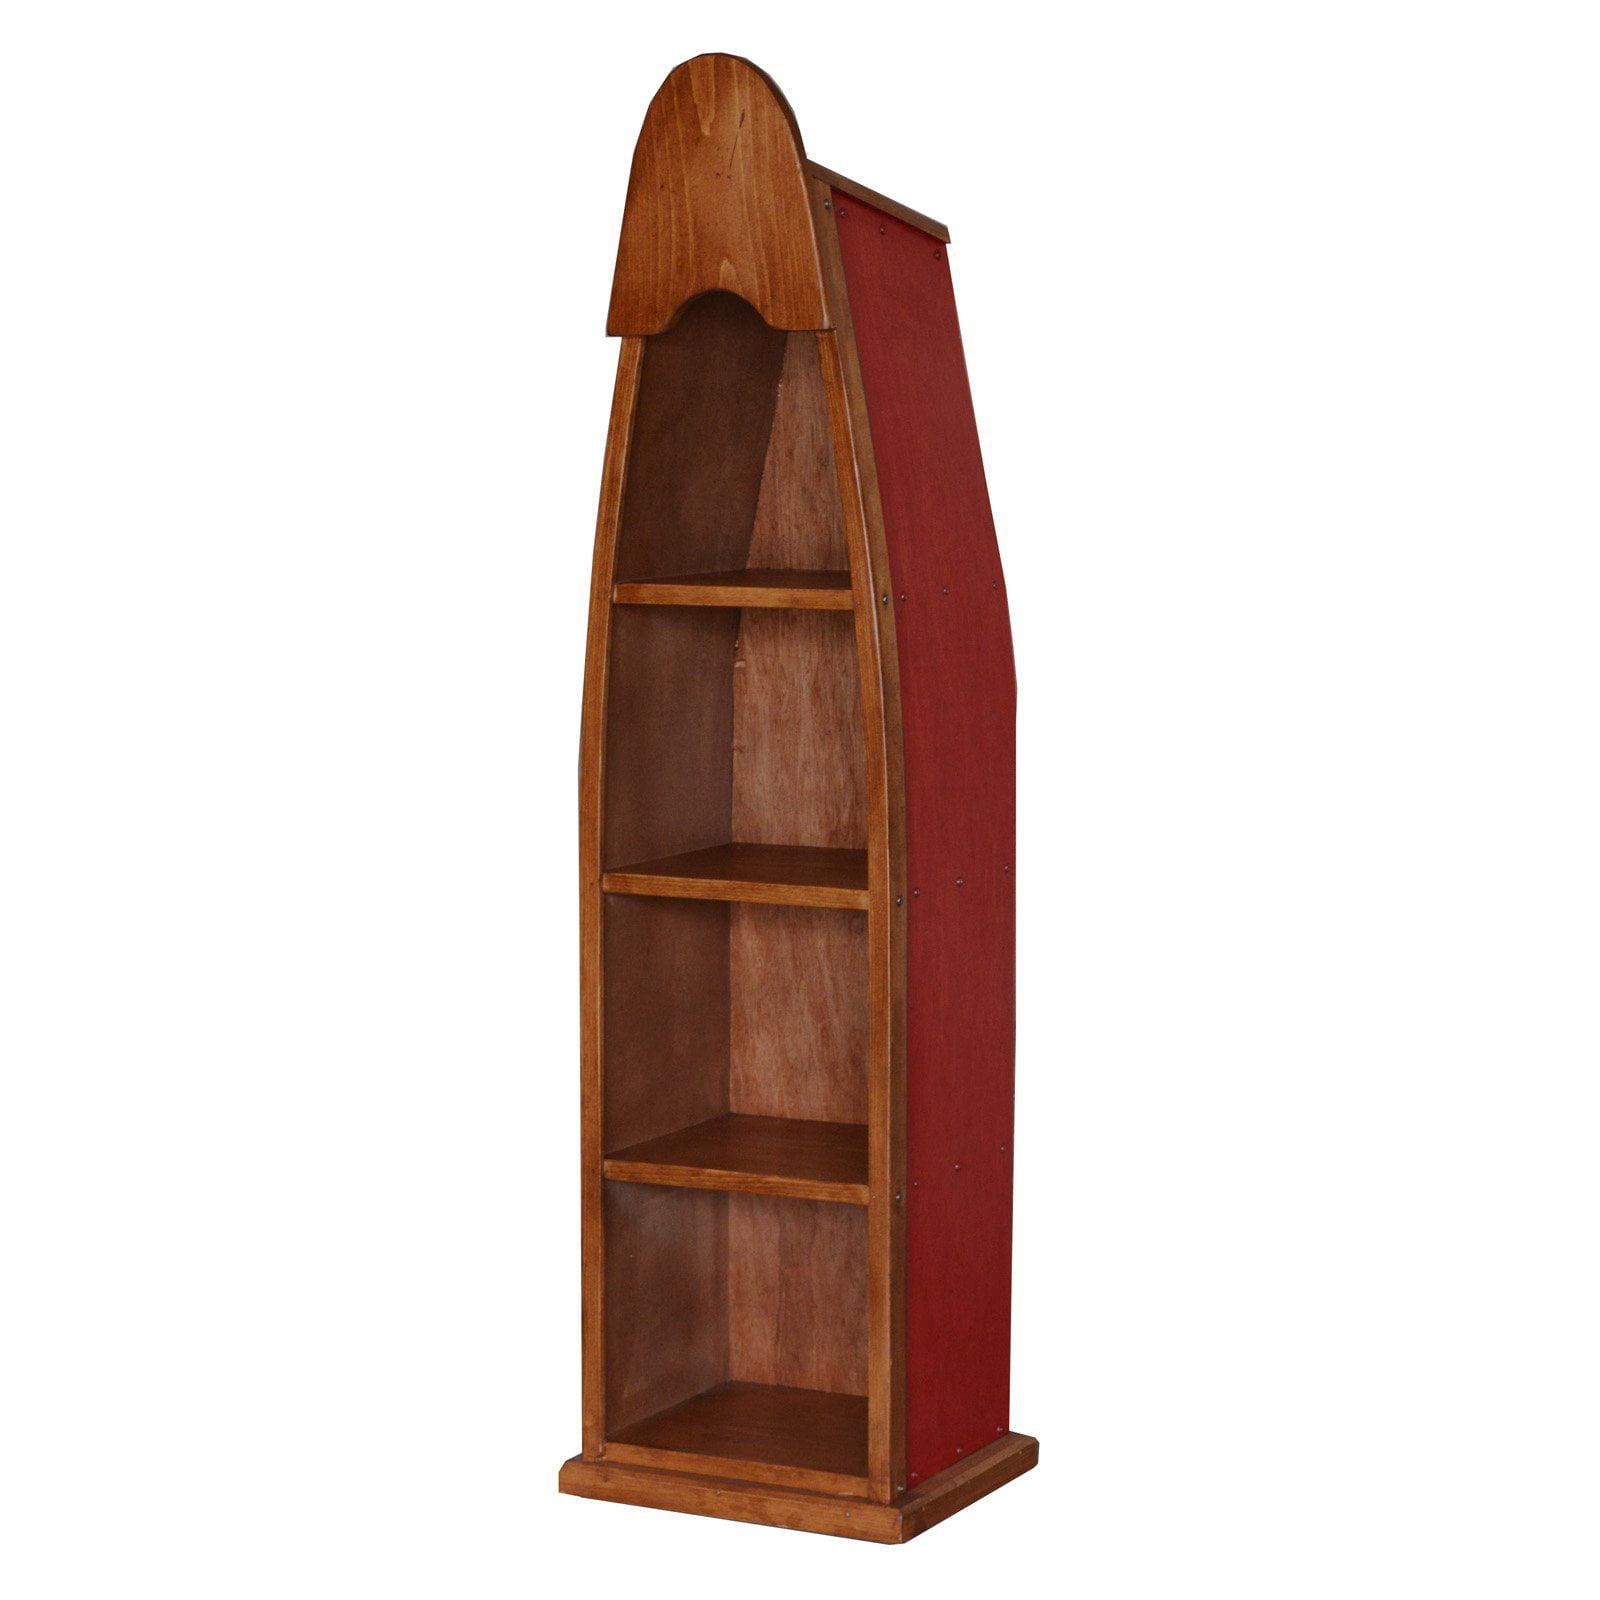 2 Day Designs Small Canoe Bookshelf   Walmart.com